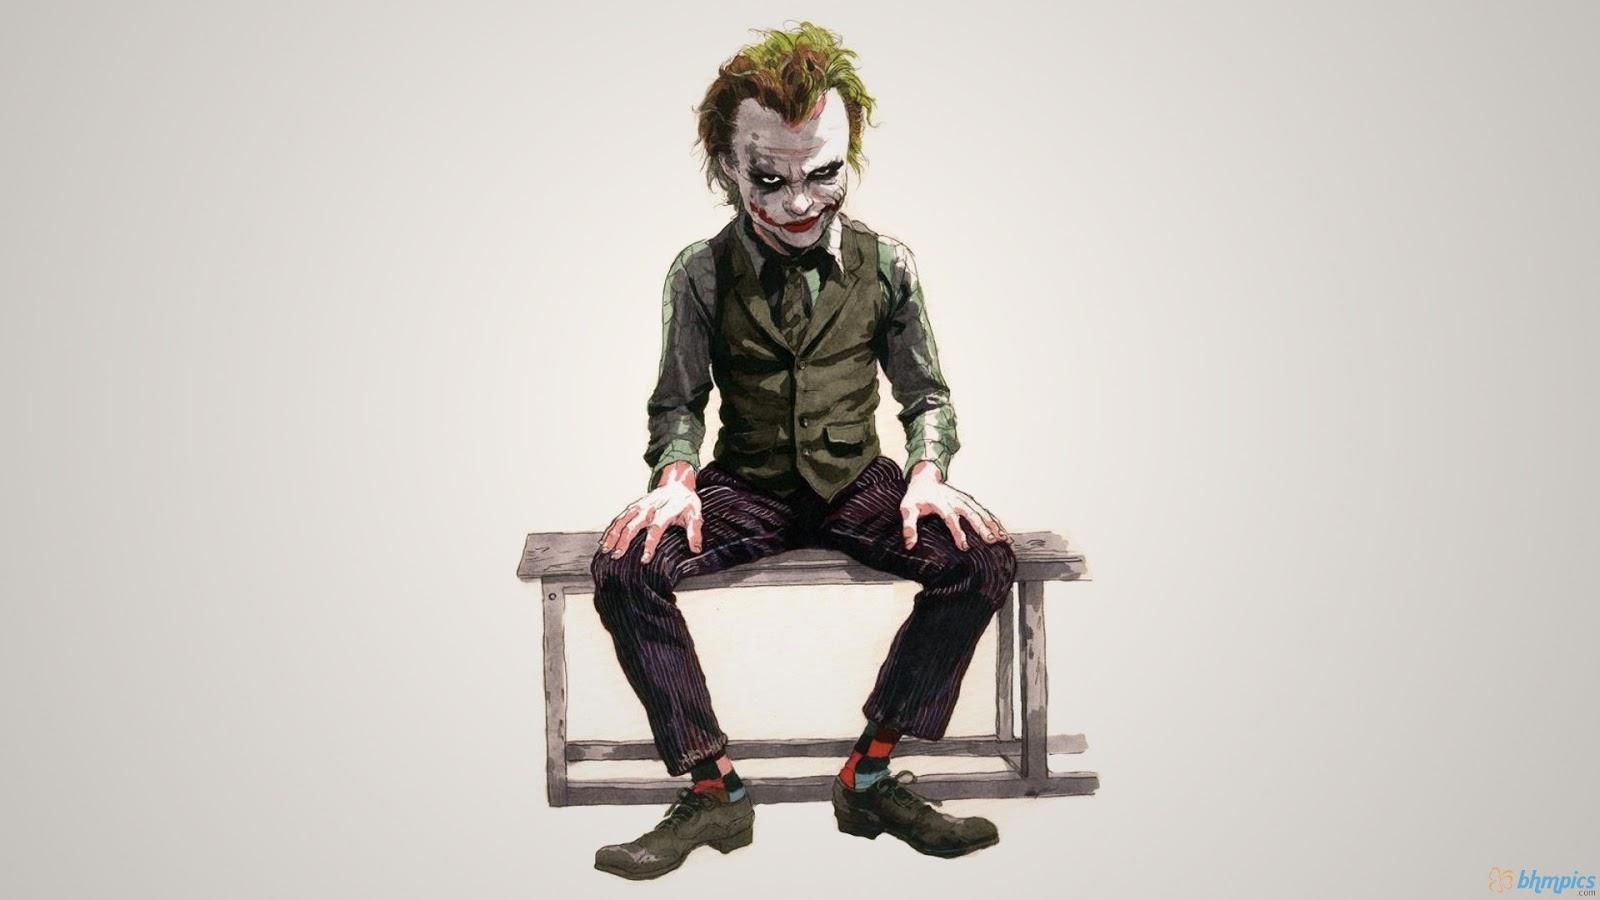 Makkhi Movie Hd Wallpaper Free Best Pictures Evil Joker Cartoon Wallpapers